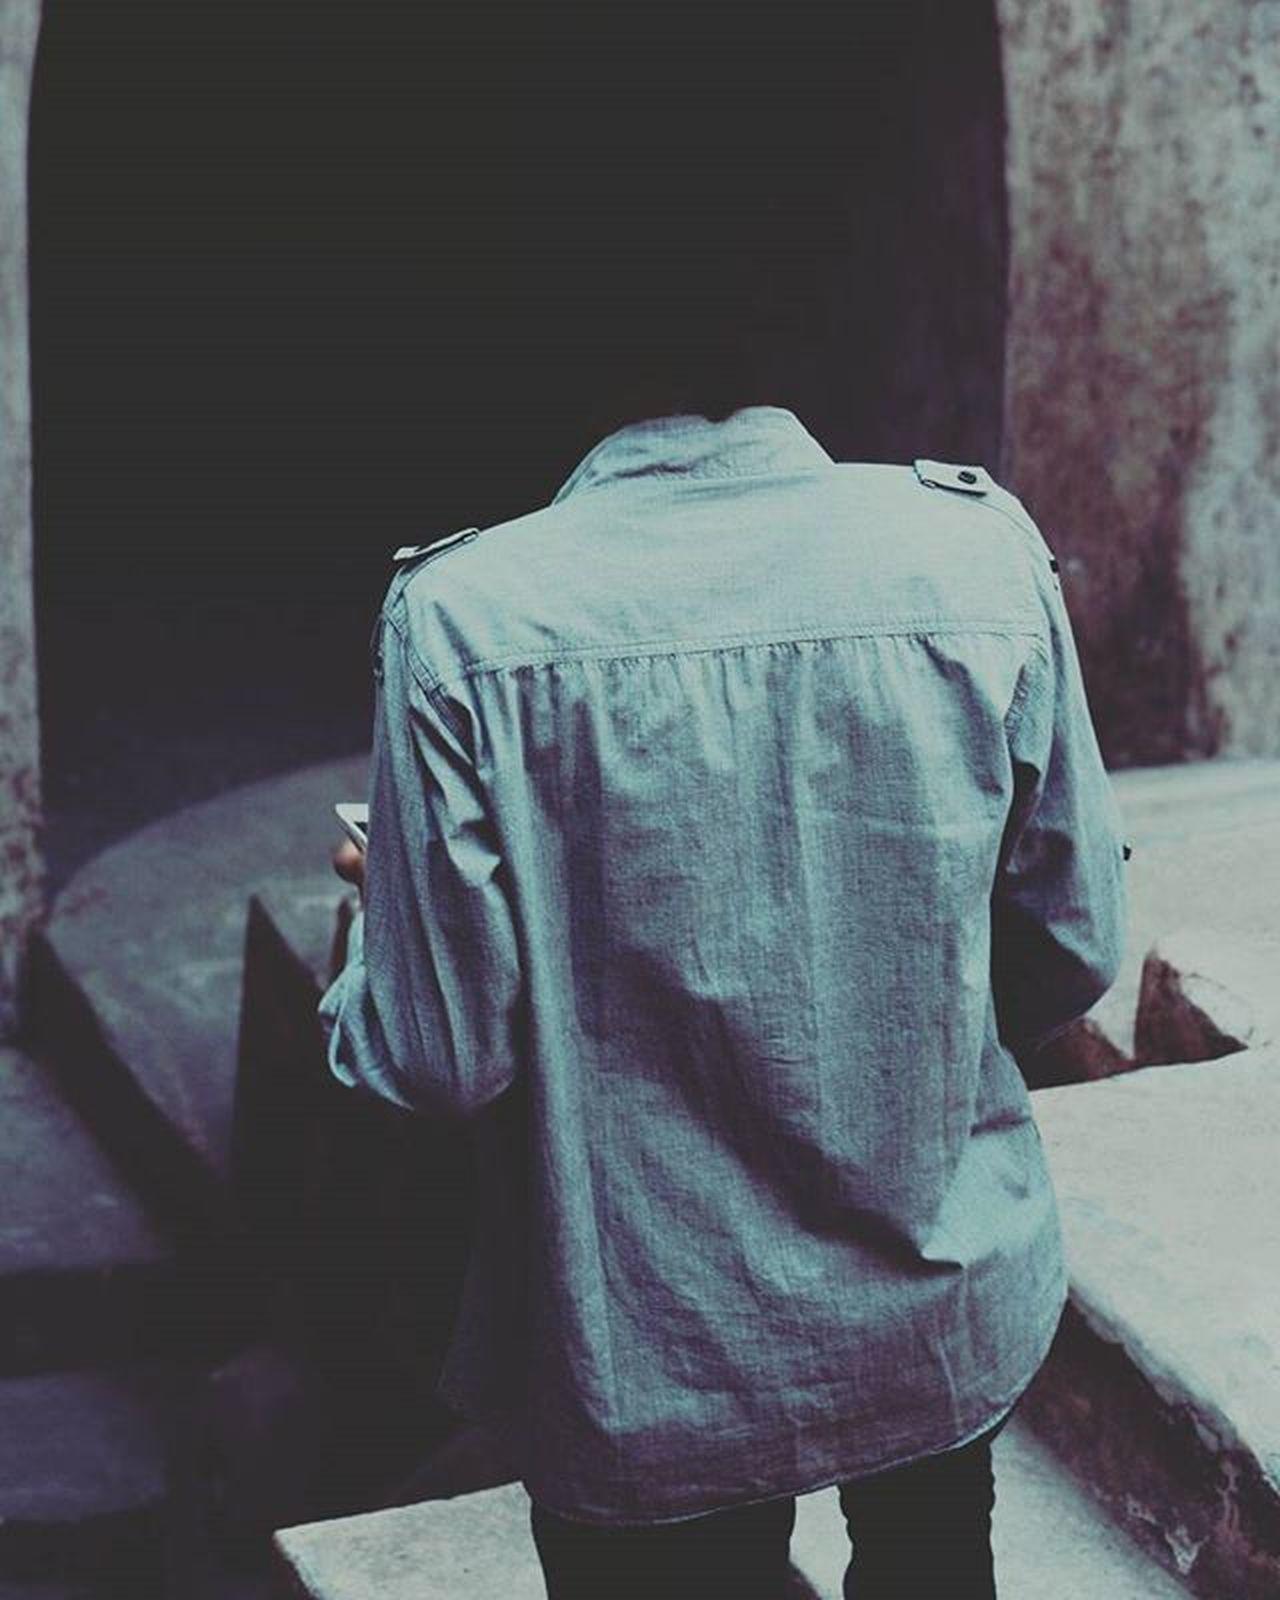 """👻🙈🙊🙊🙊🙈🙈👻👻👻👻👻"". . . . Hastag : Vscocam Tamansari Yogyakarta Jogjaku Jogjamedia Explorejogja Instagram Pesonajogja Wonderfuljogja Nyelopiknik Potretjogja Loosingmymind"